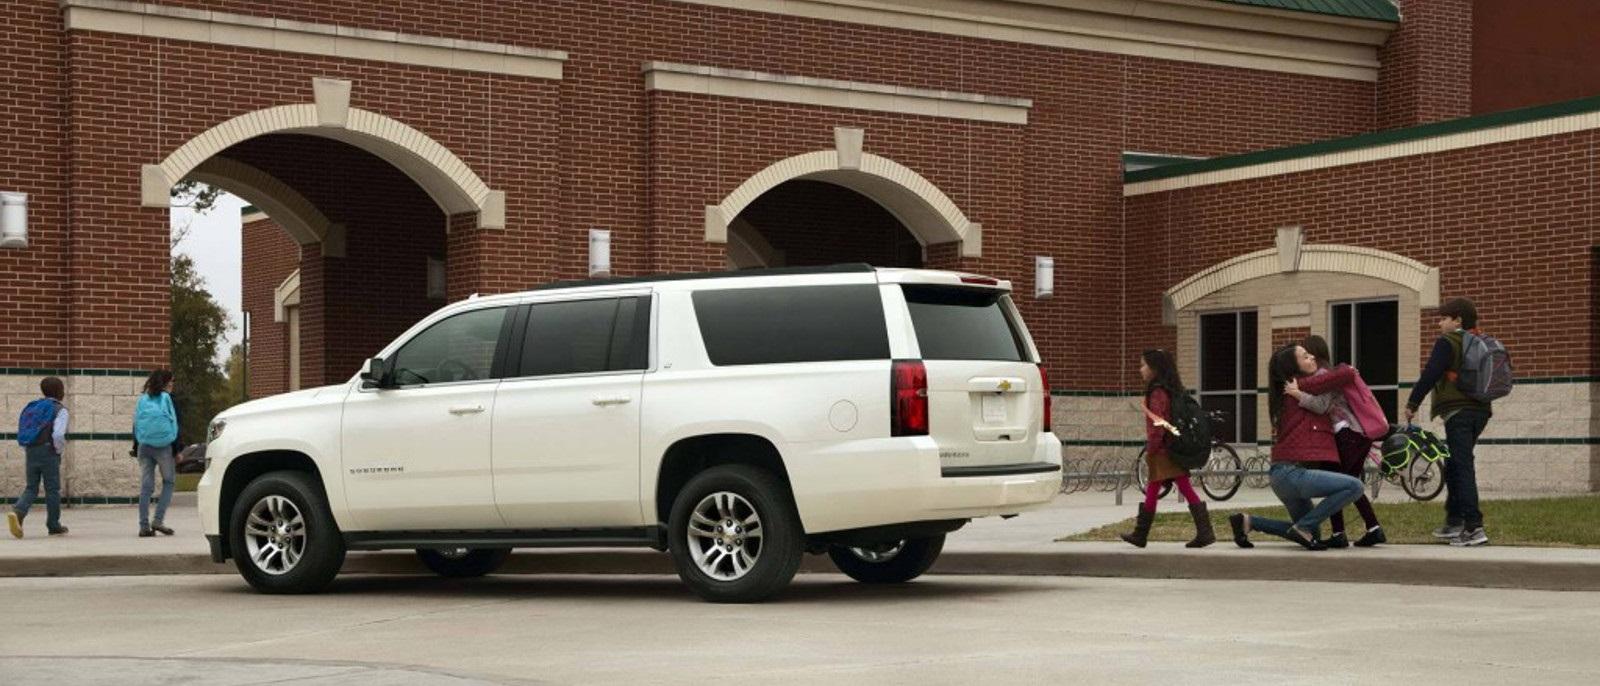 Suburban 2017 chevy suburban : 2017 Chevrolet Suburban Impresses Flint and Grand Blanc, MI